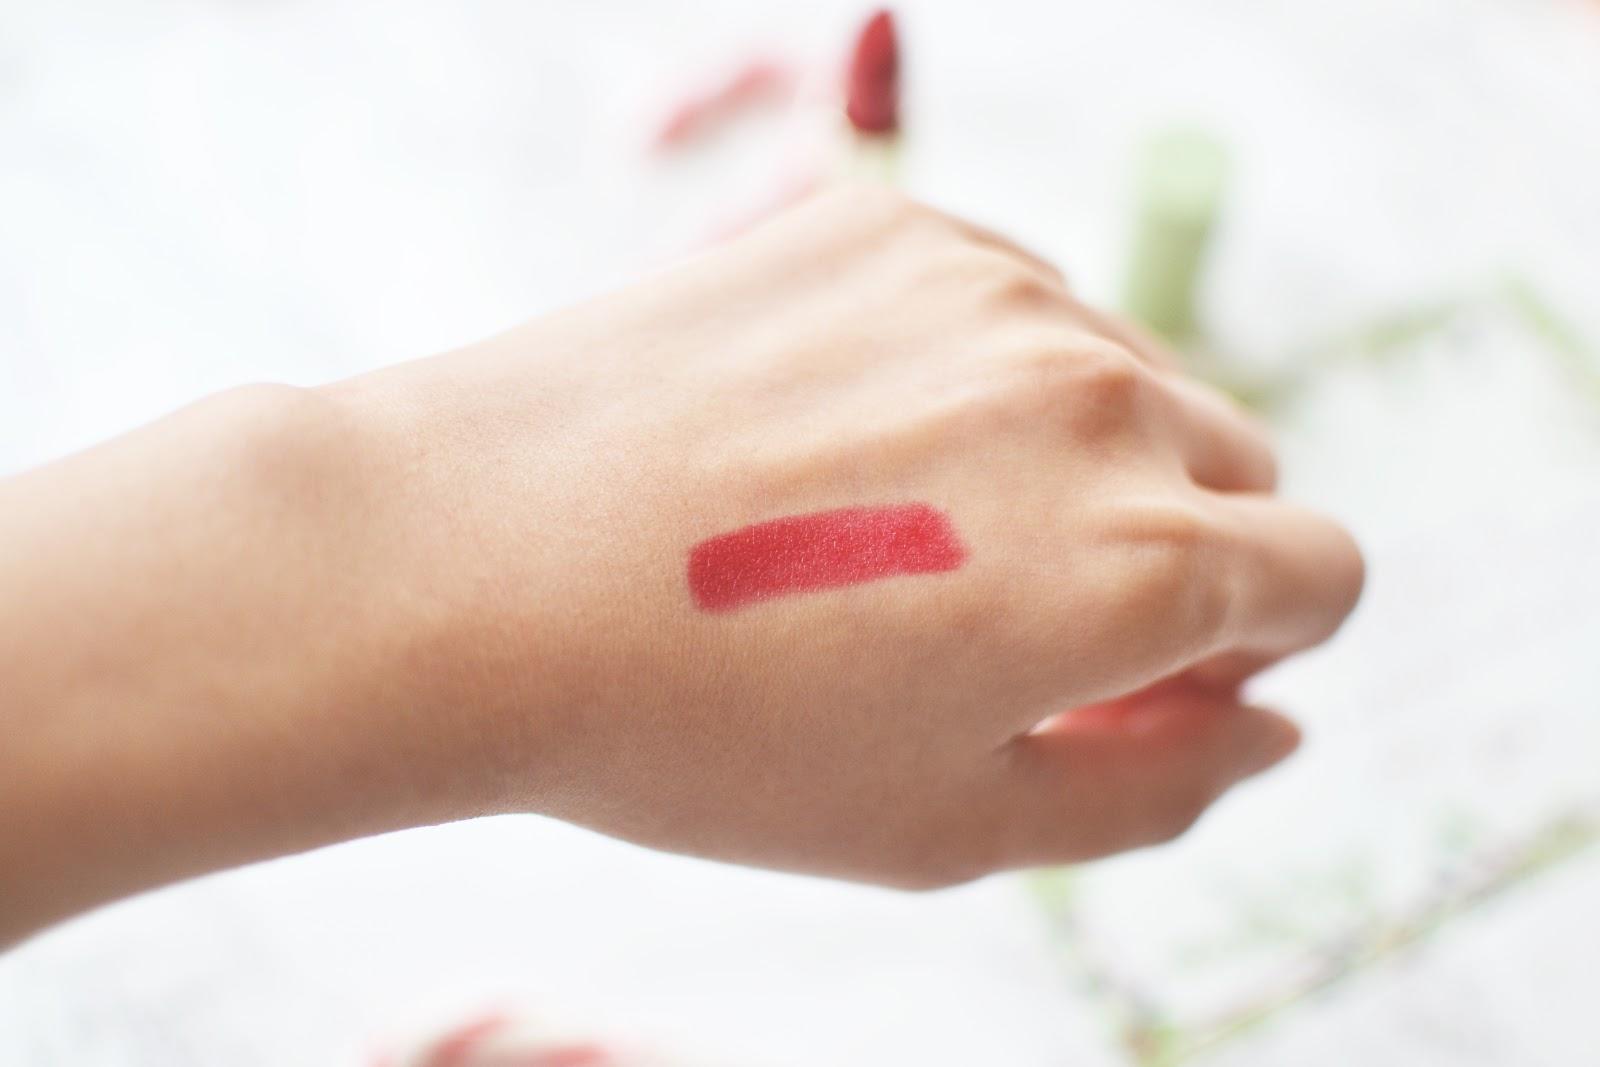 pixi by petra Mattelustre Lipstick classic red